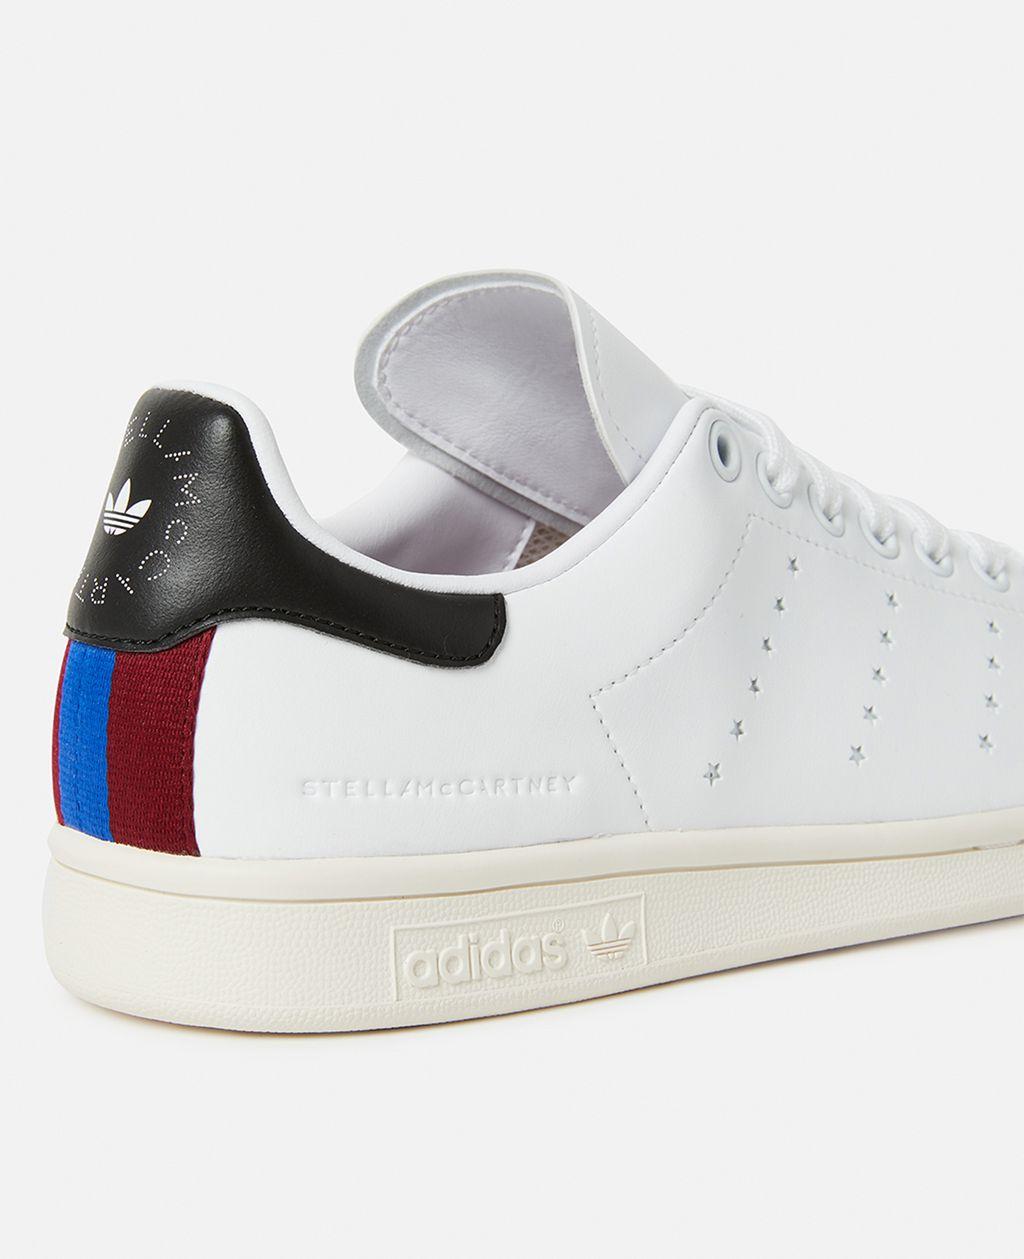 Adidas Originals First Collaboration With Stella McCartney